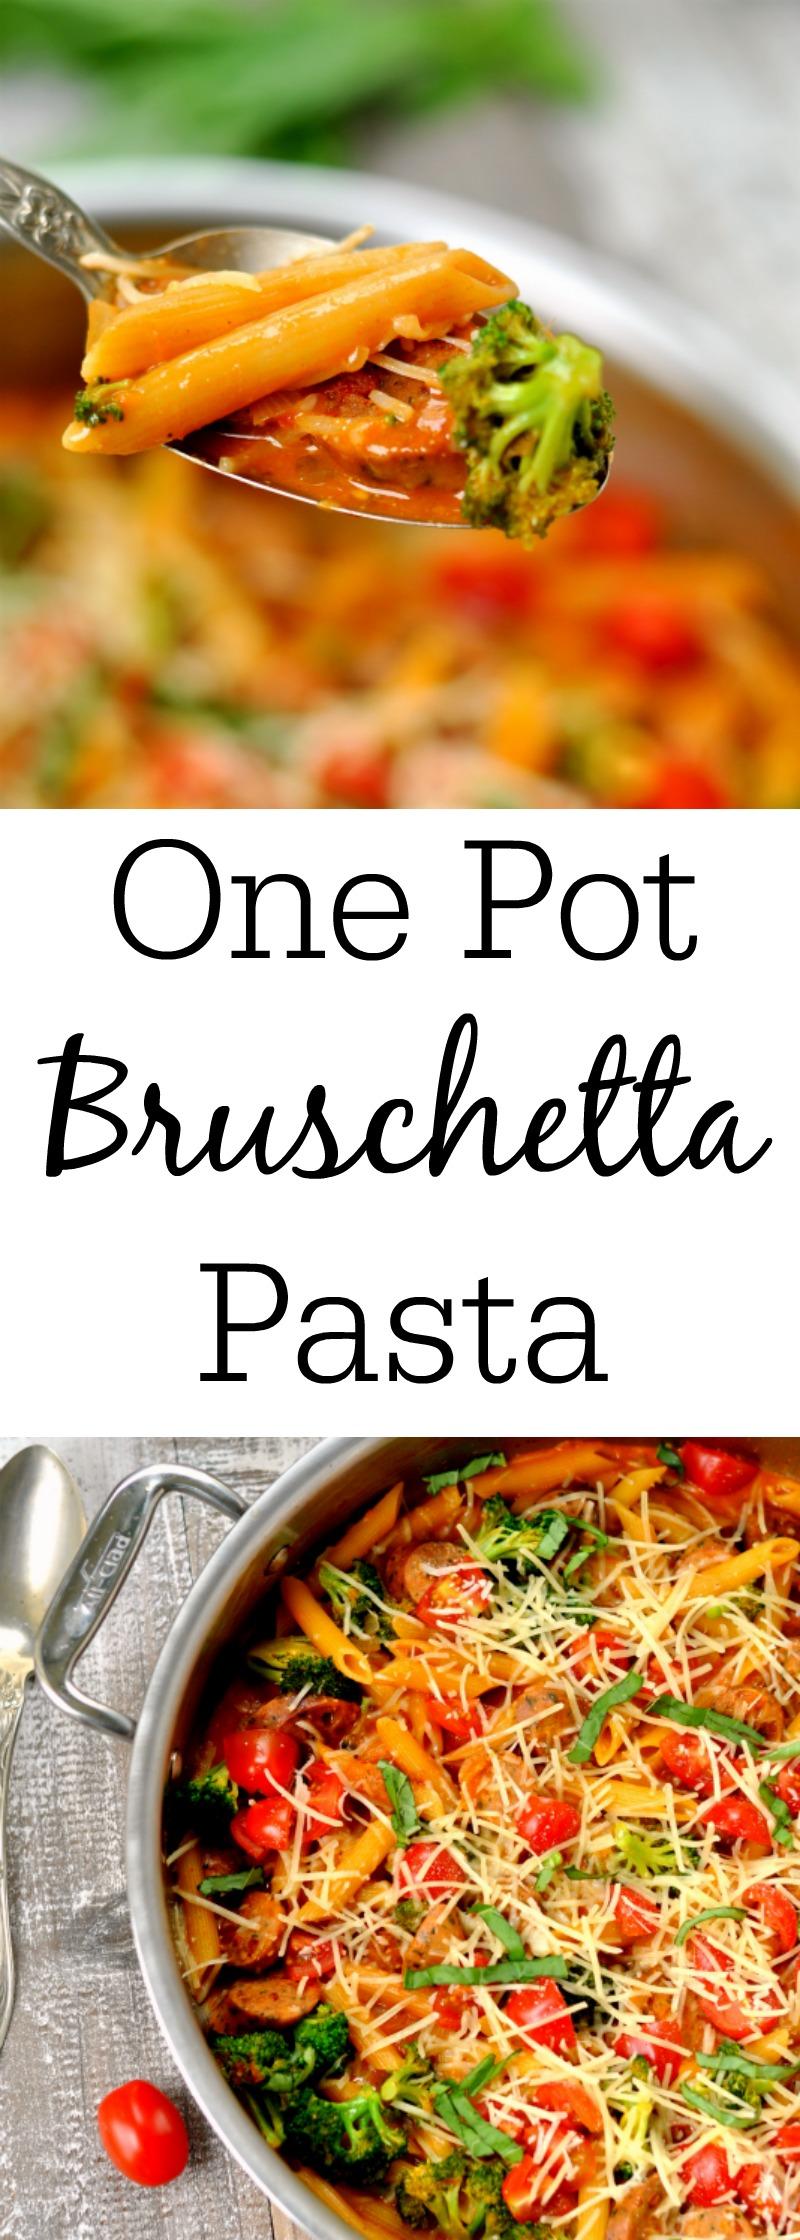 One Pot Bruschetta Pasta